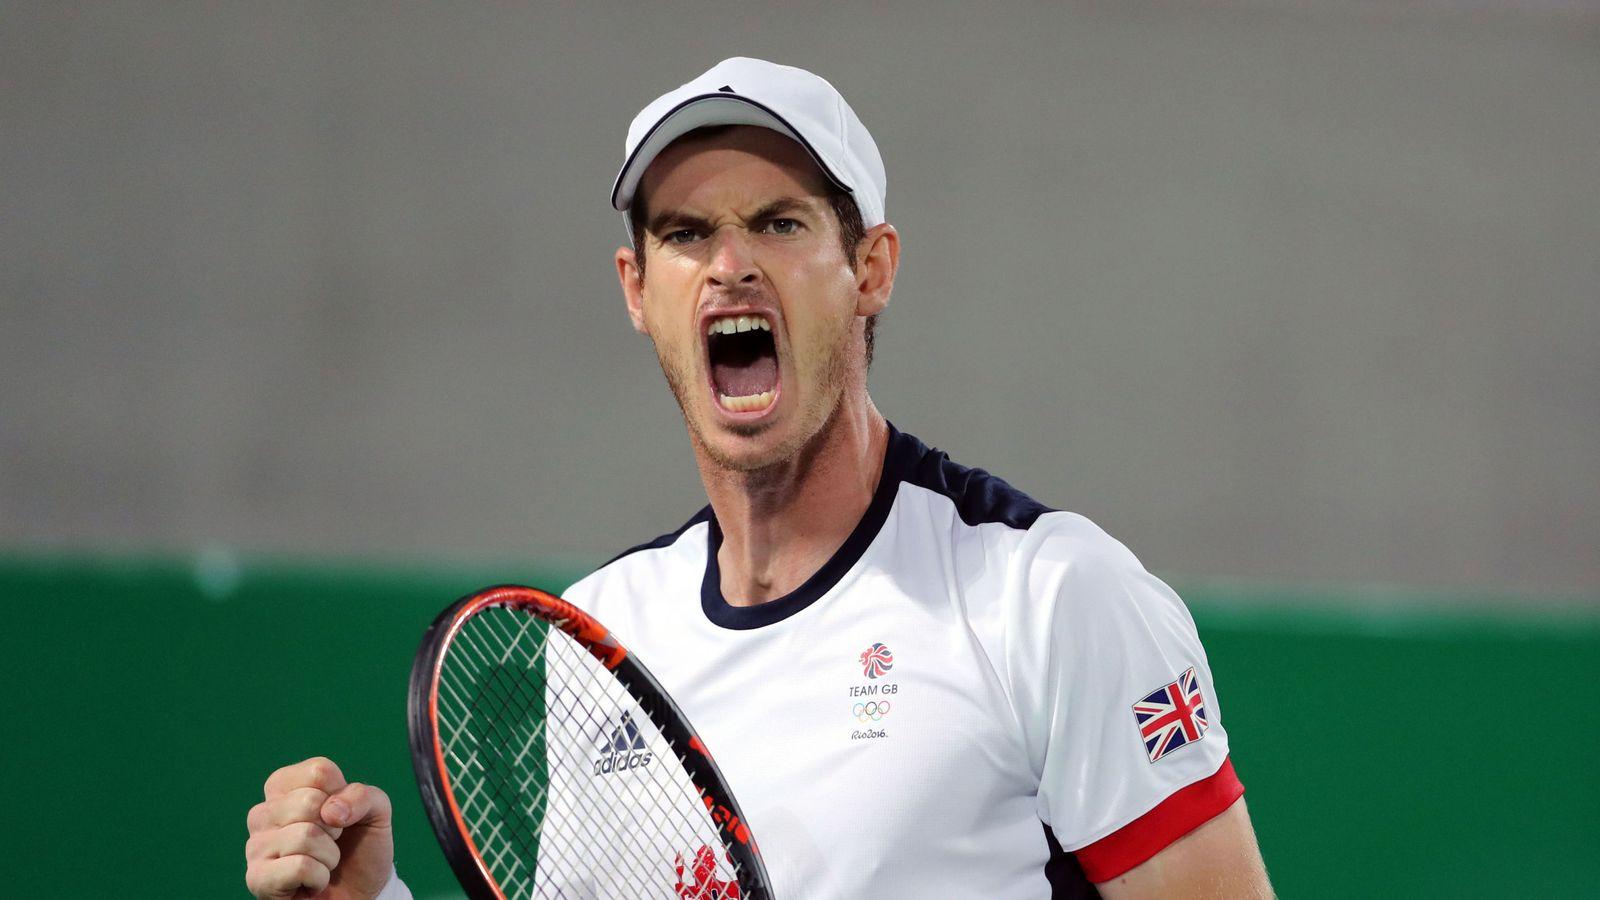 Andy Murray in Cincinnati Open action on Sky Sports   Tennis News   Sky ...